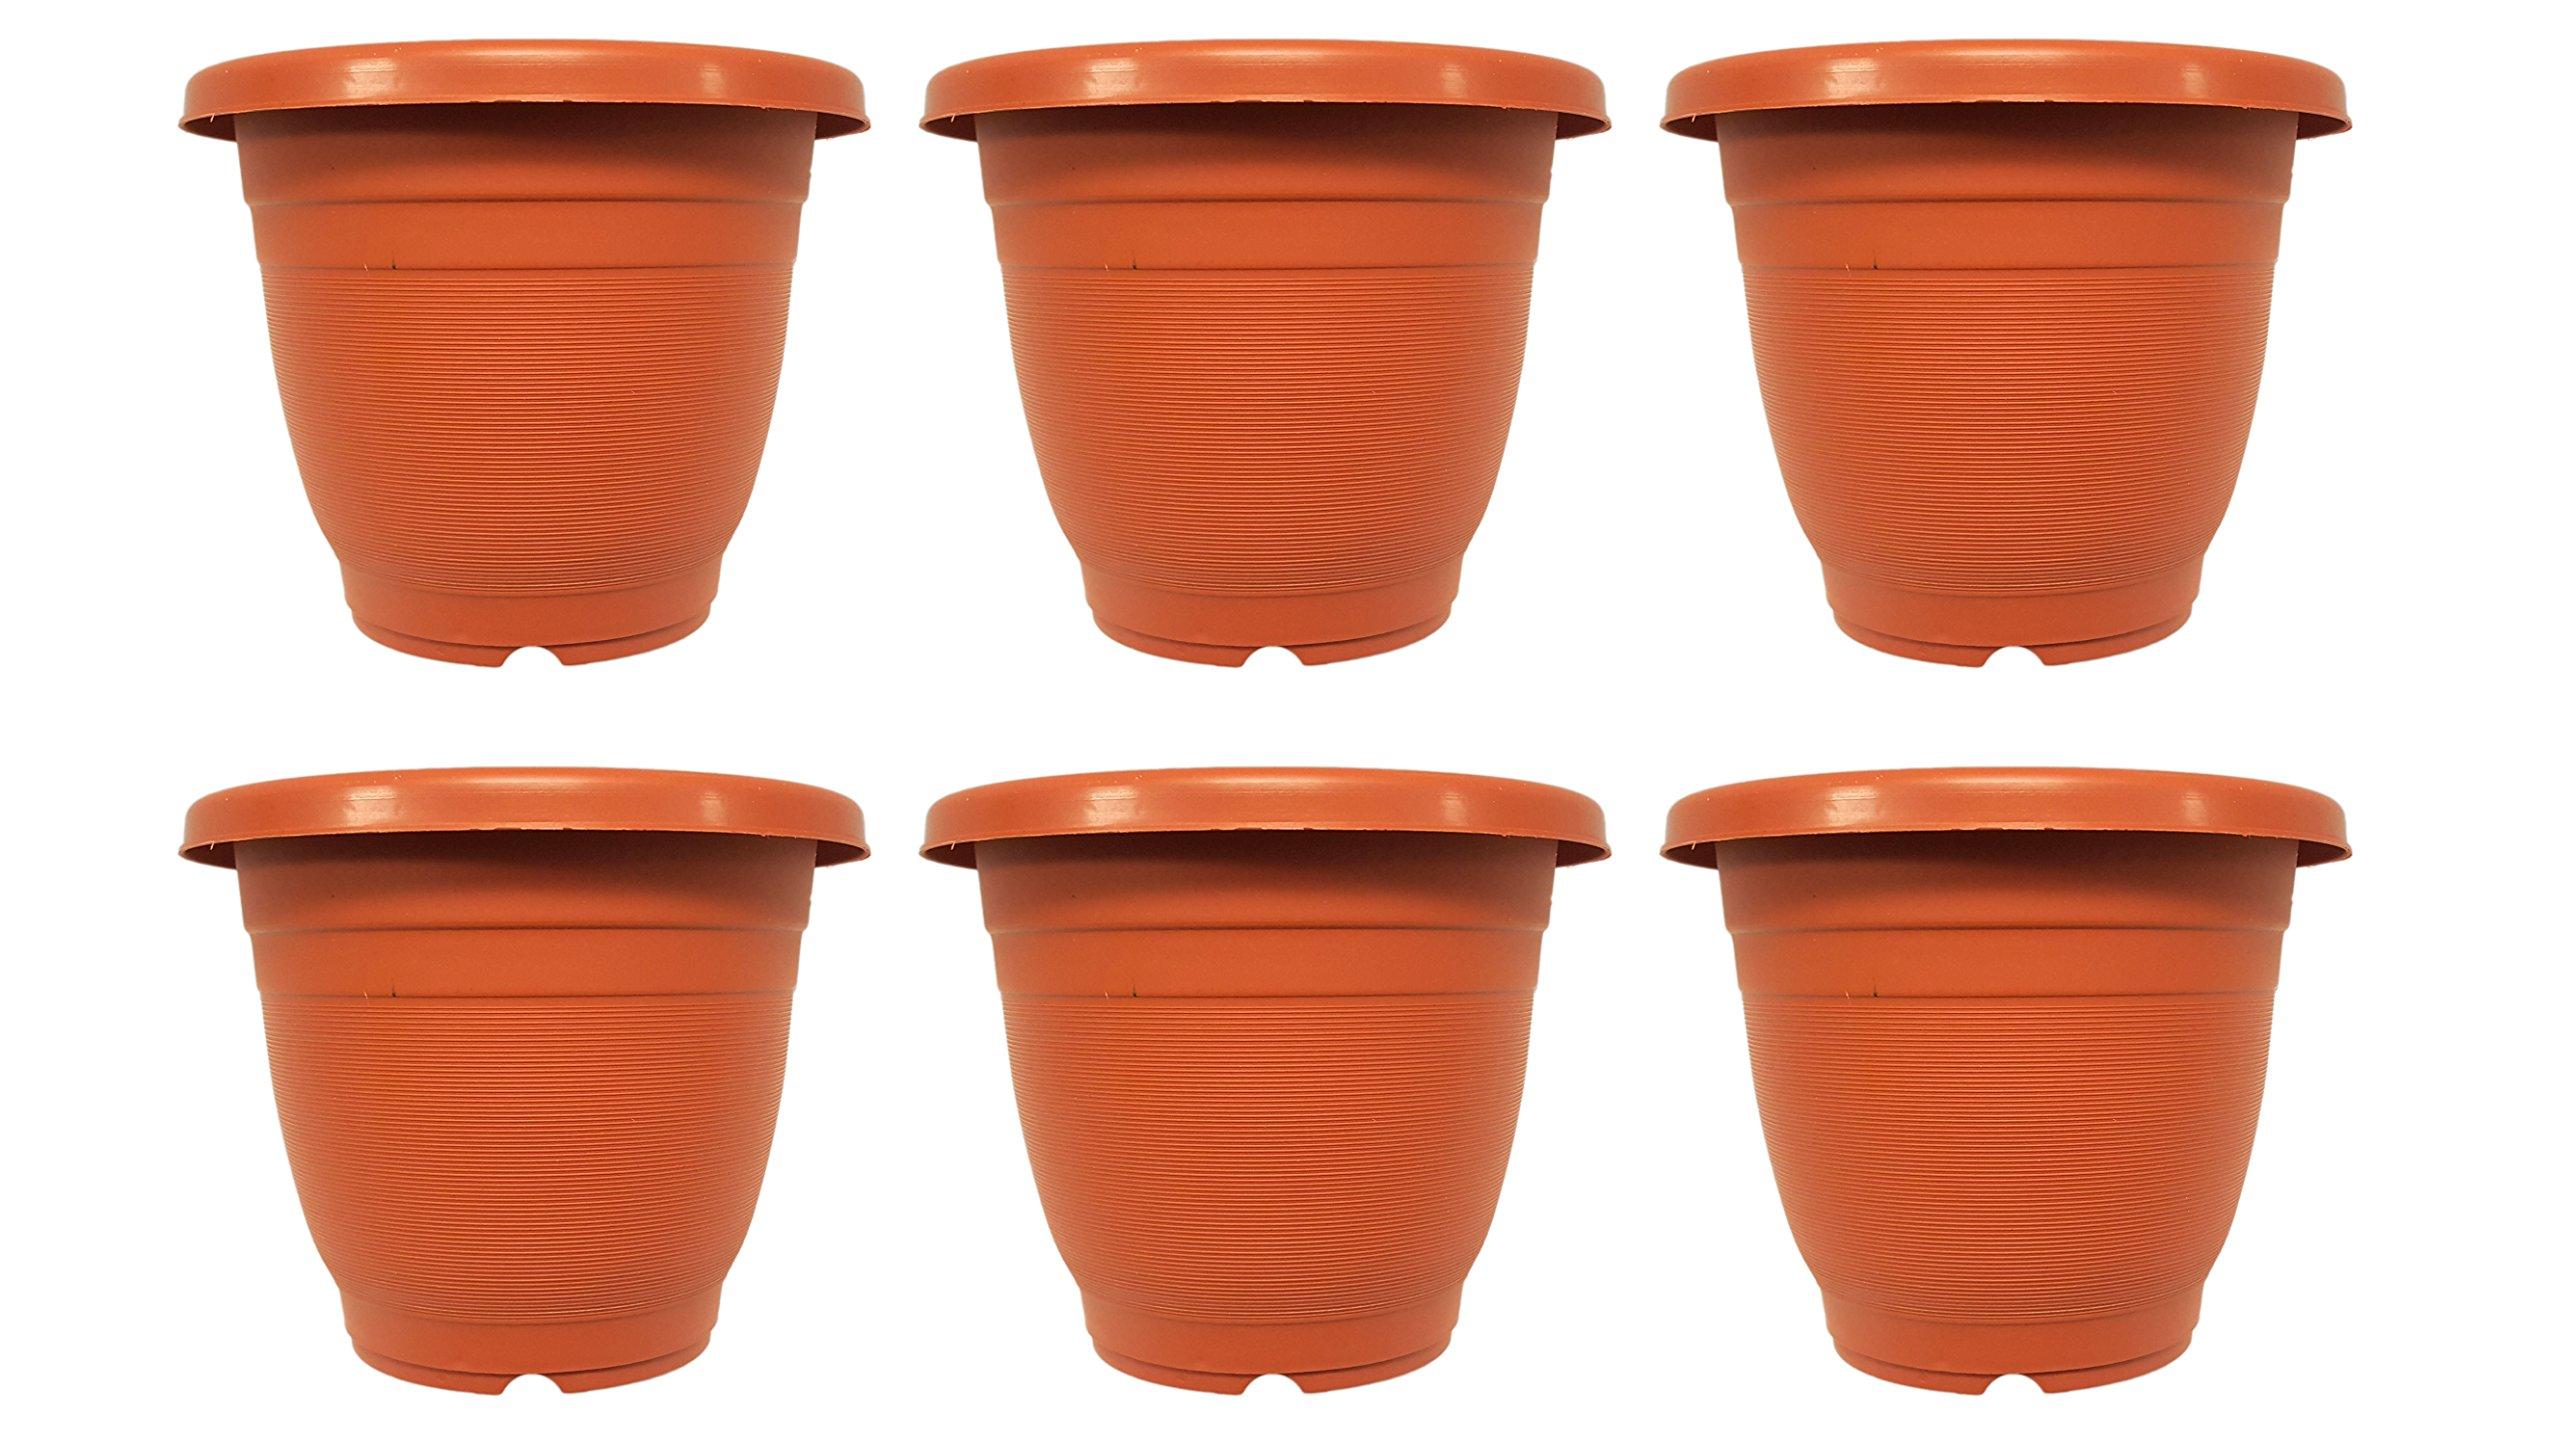 "Set of 6 Planters Brown Round 7"" x 6"" Planters / Pots (Brown)"